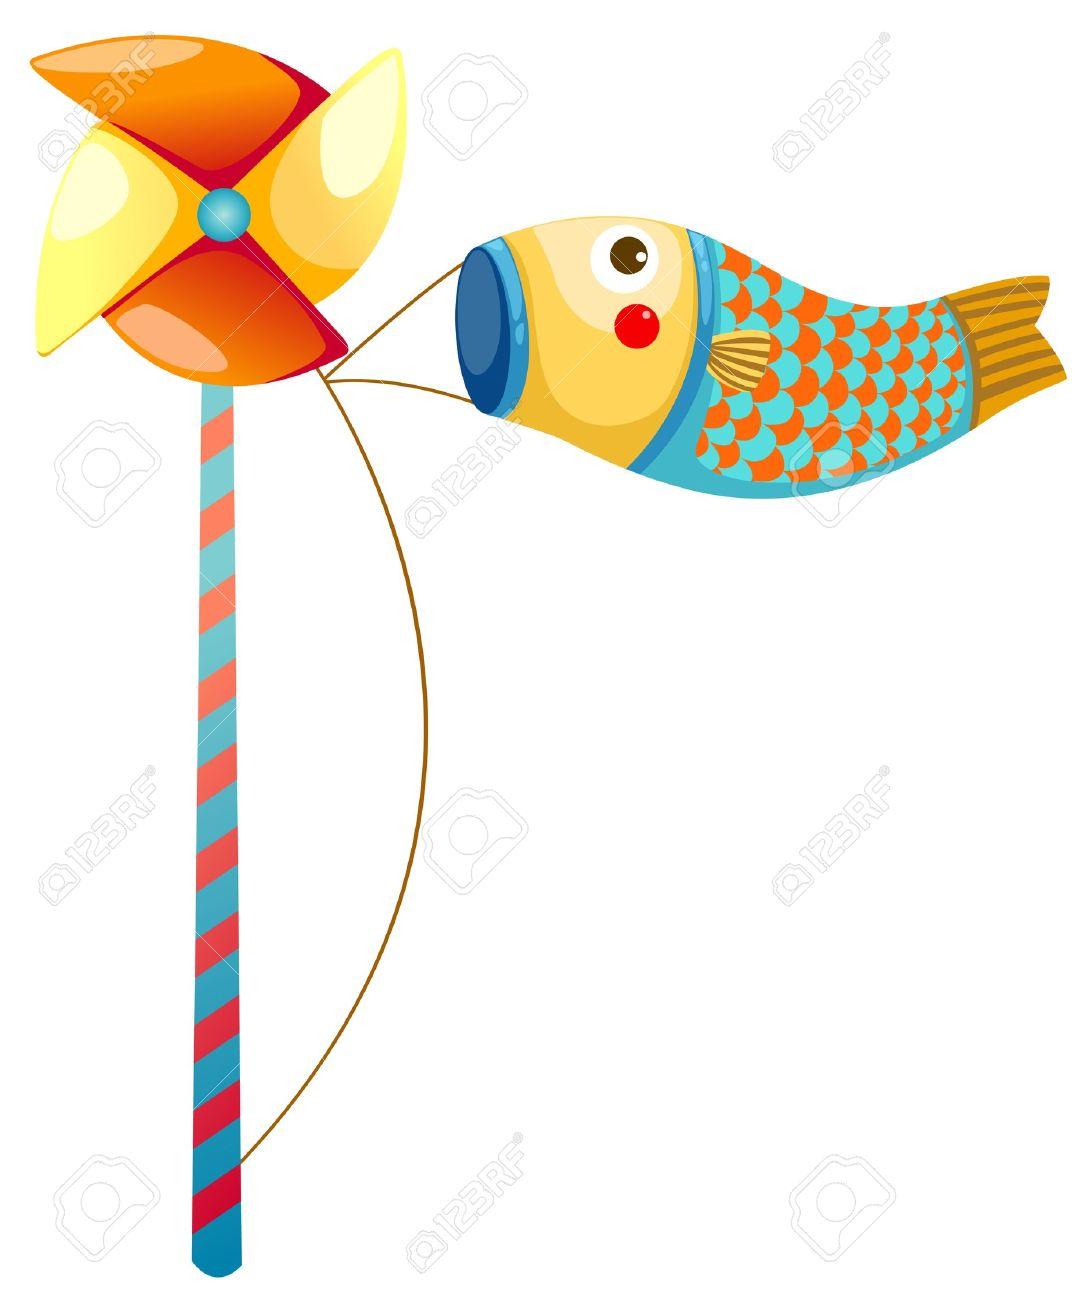 Japanese koi carp windsocks Stock Vector - 16739305